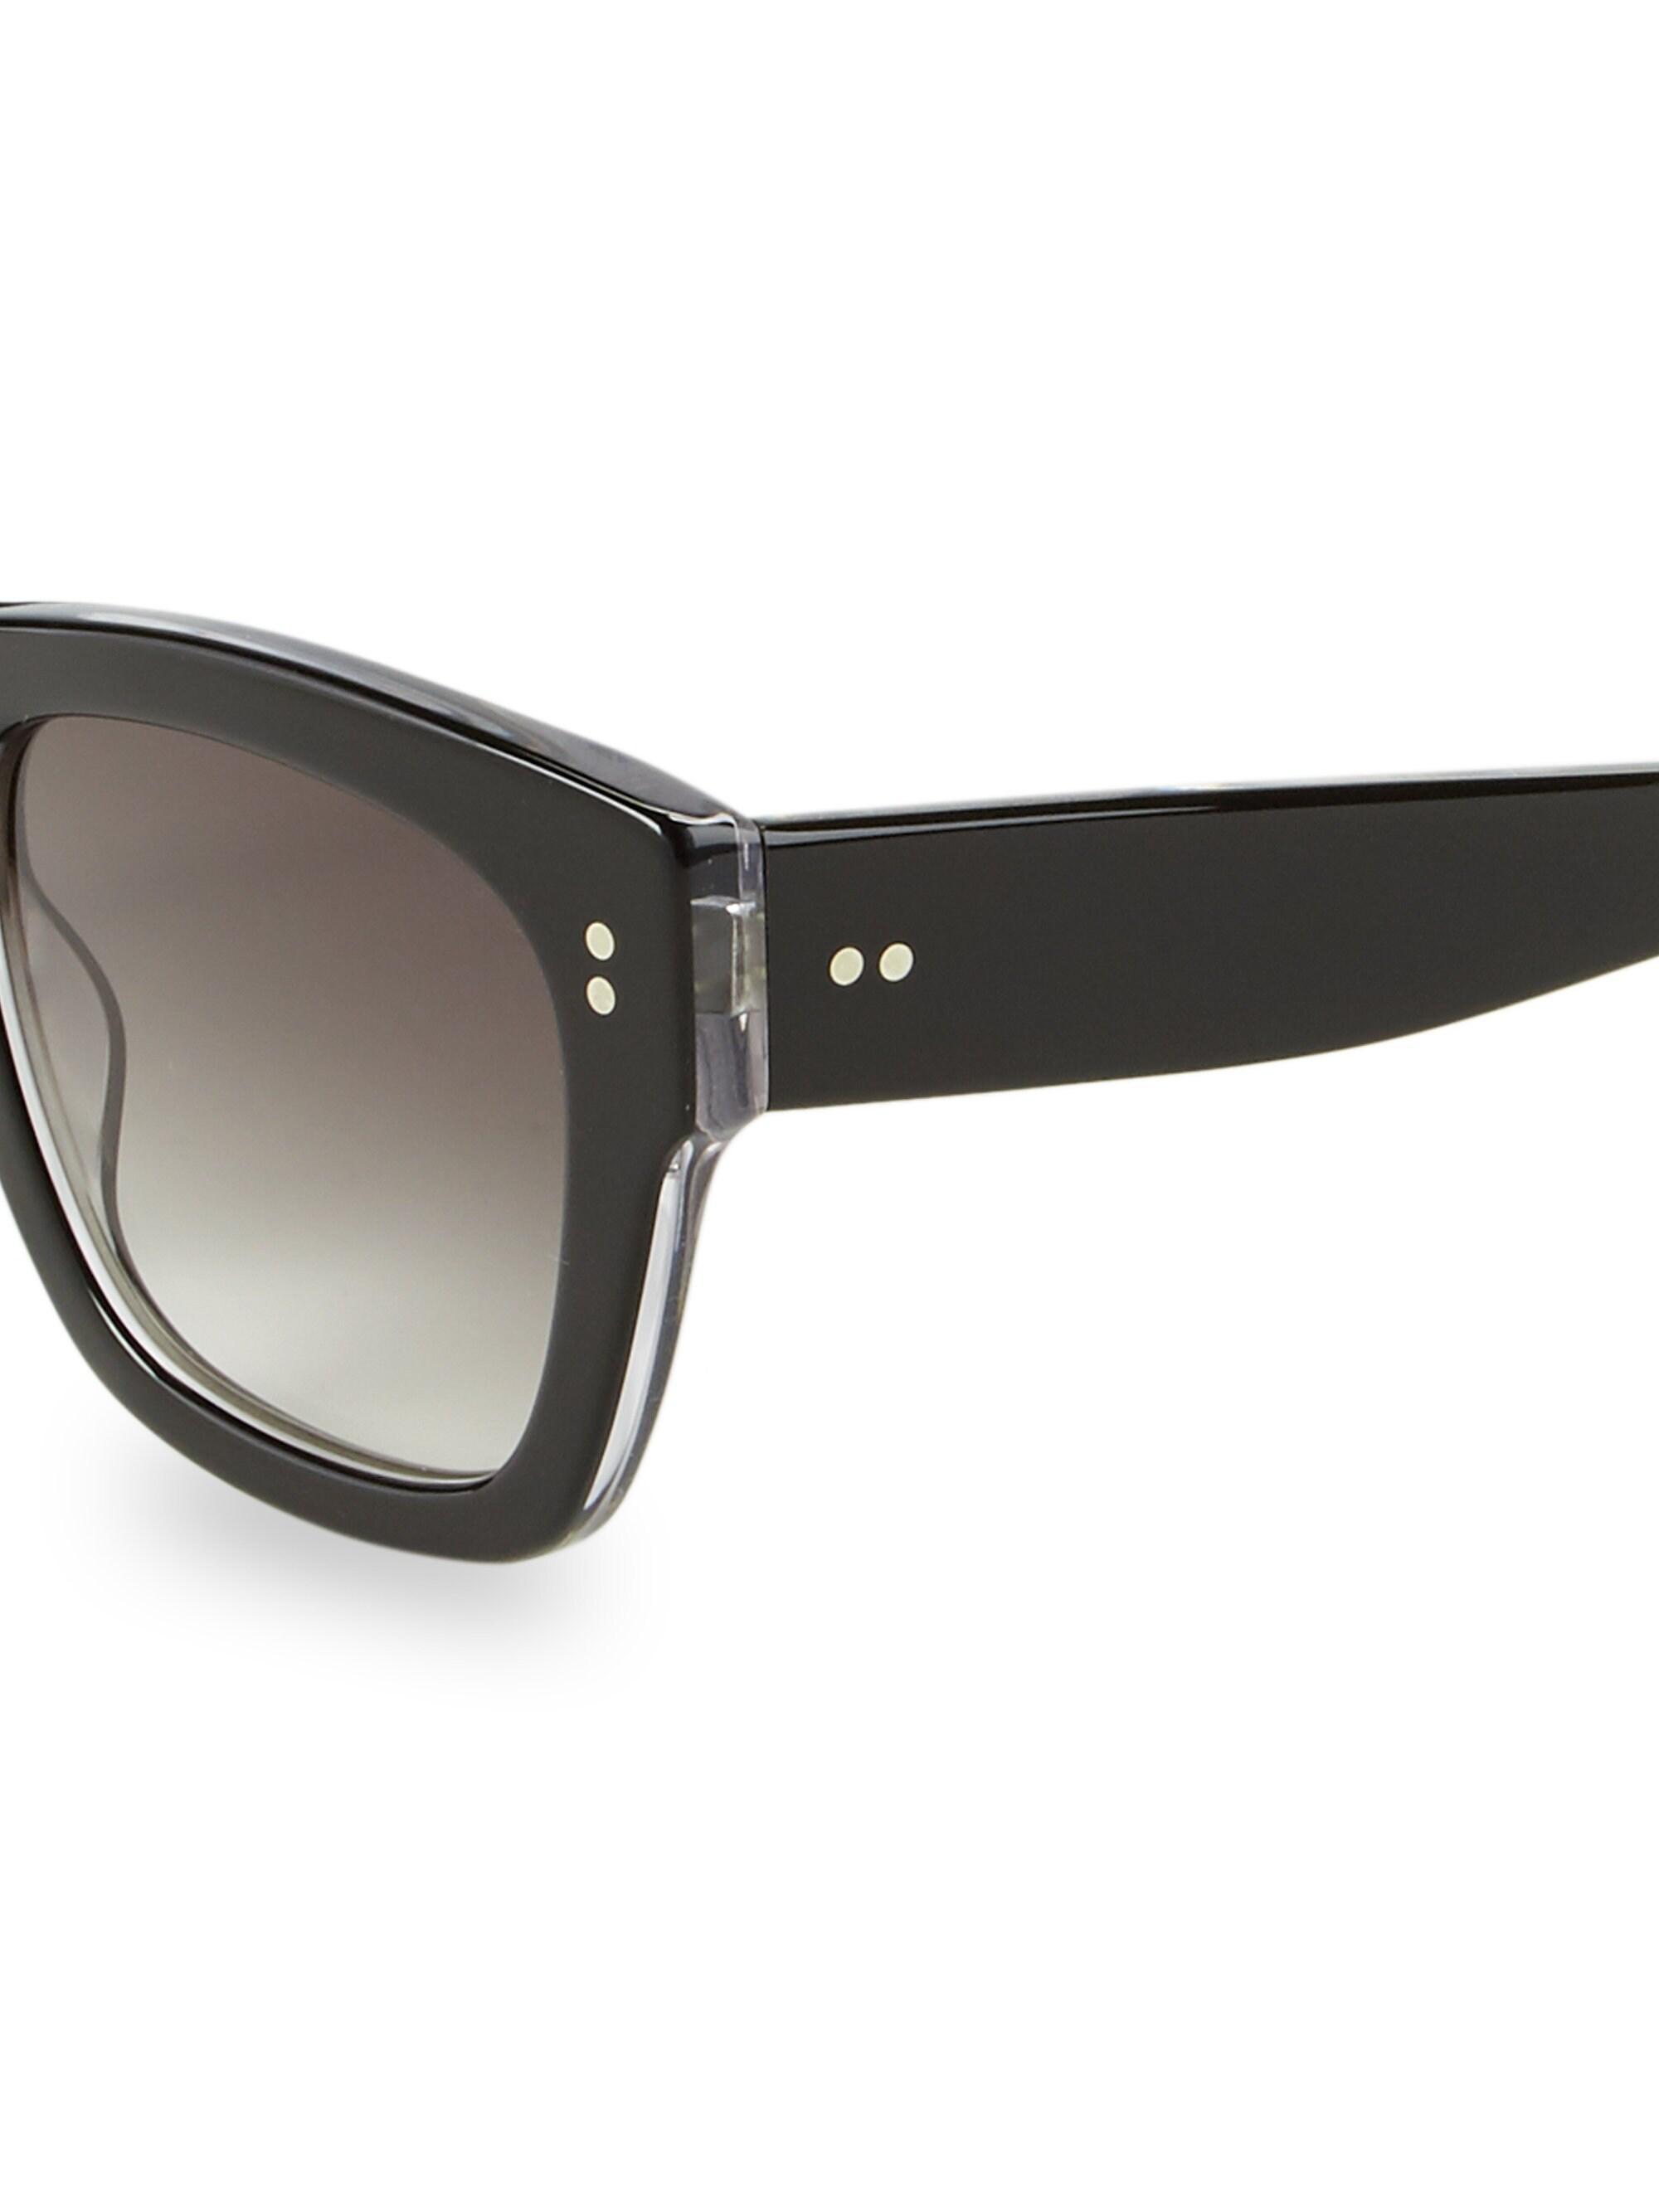 cb1377c6c Colors In Optics Women's 51mm Panther Ii Rectangular Sunglasses - Black in  Black - Lyst